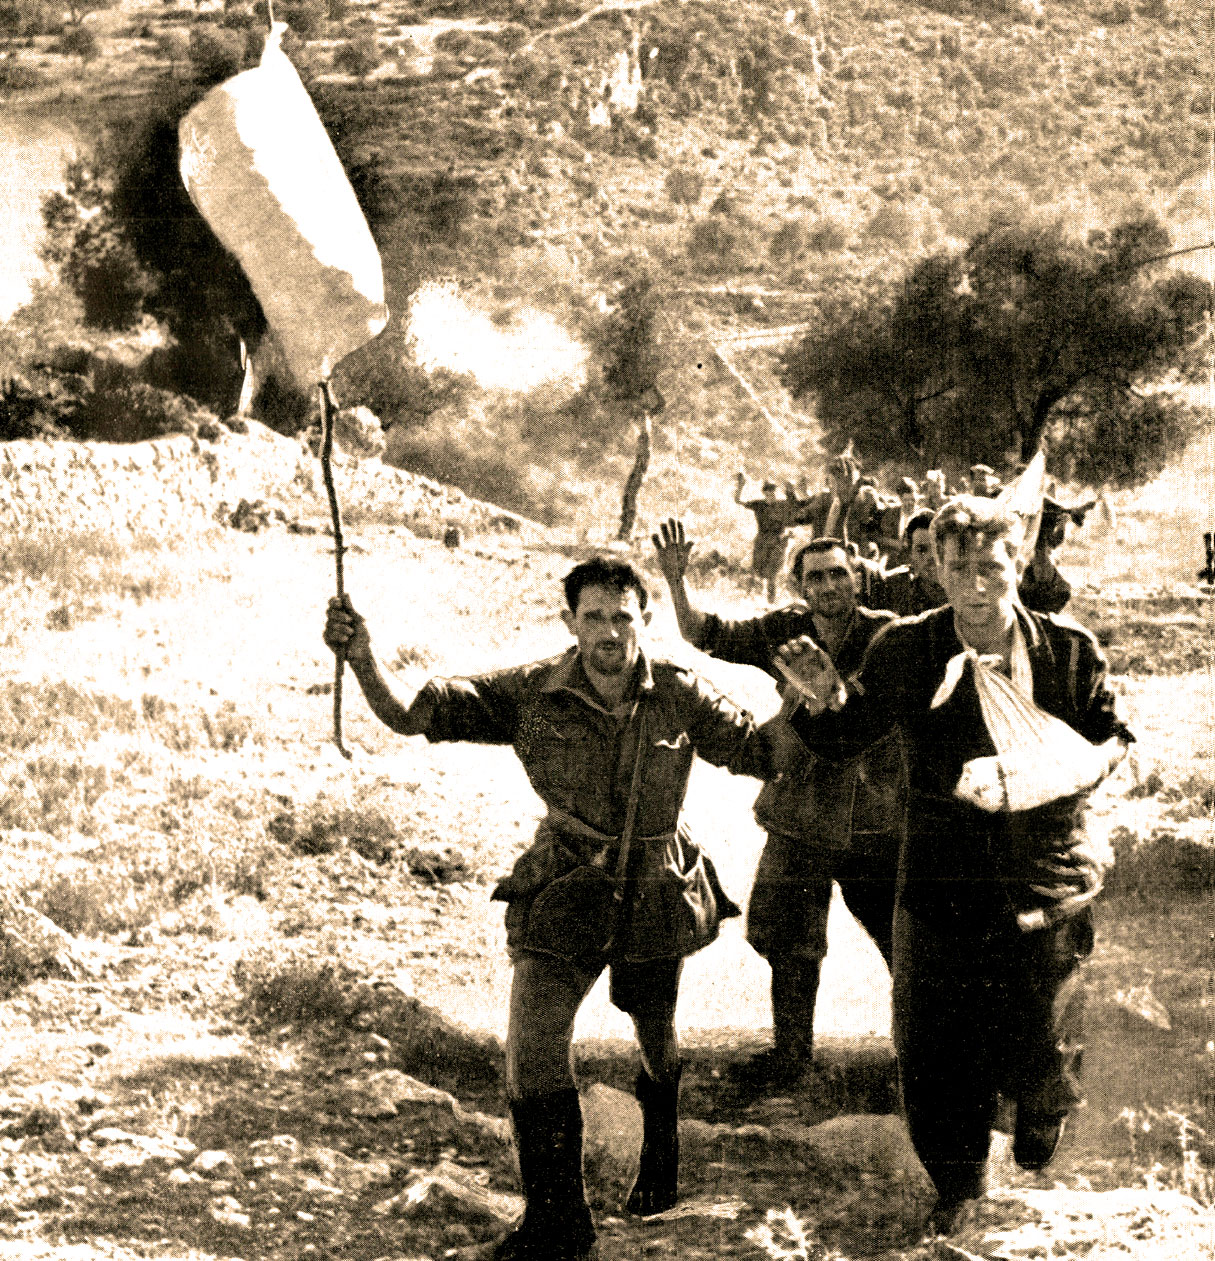 October 17, 1943 – The World At War – Changing Tides – Long Roads Back